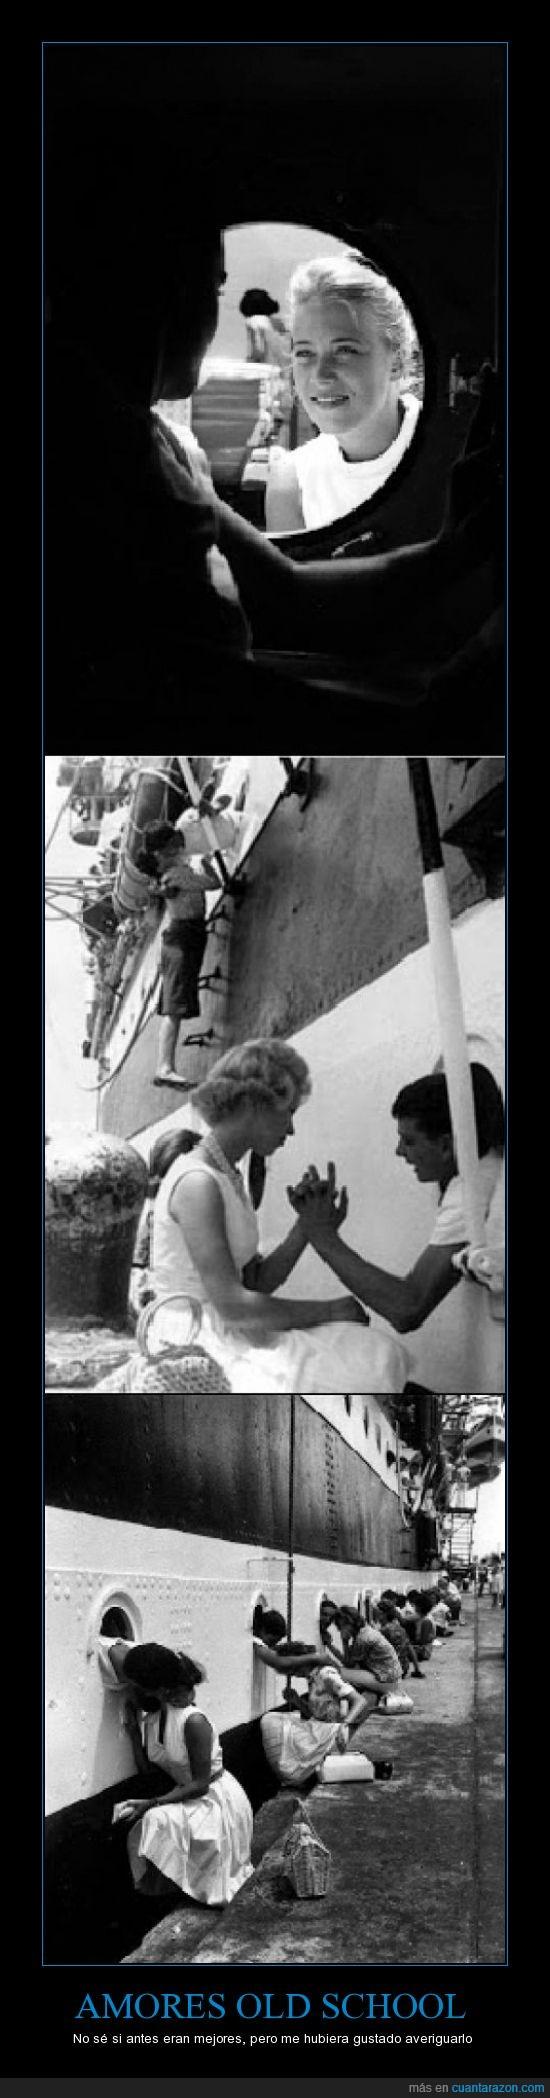 Amores,Buque miltar,despedida,escuela,Italia